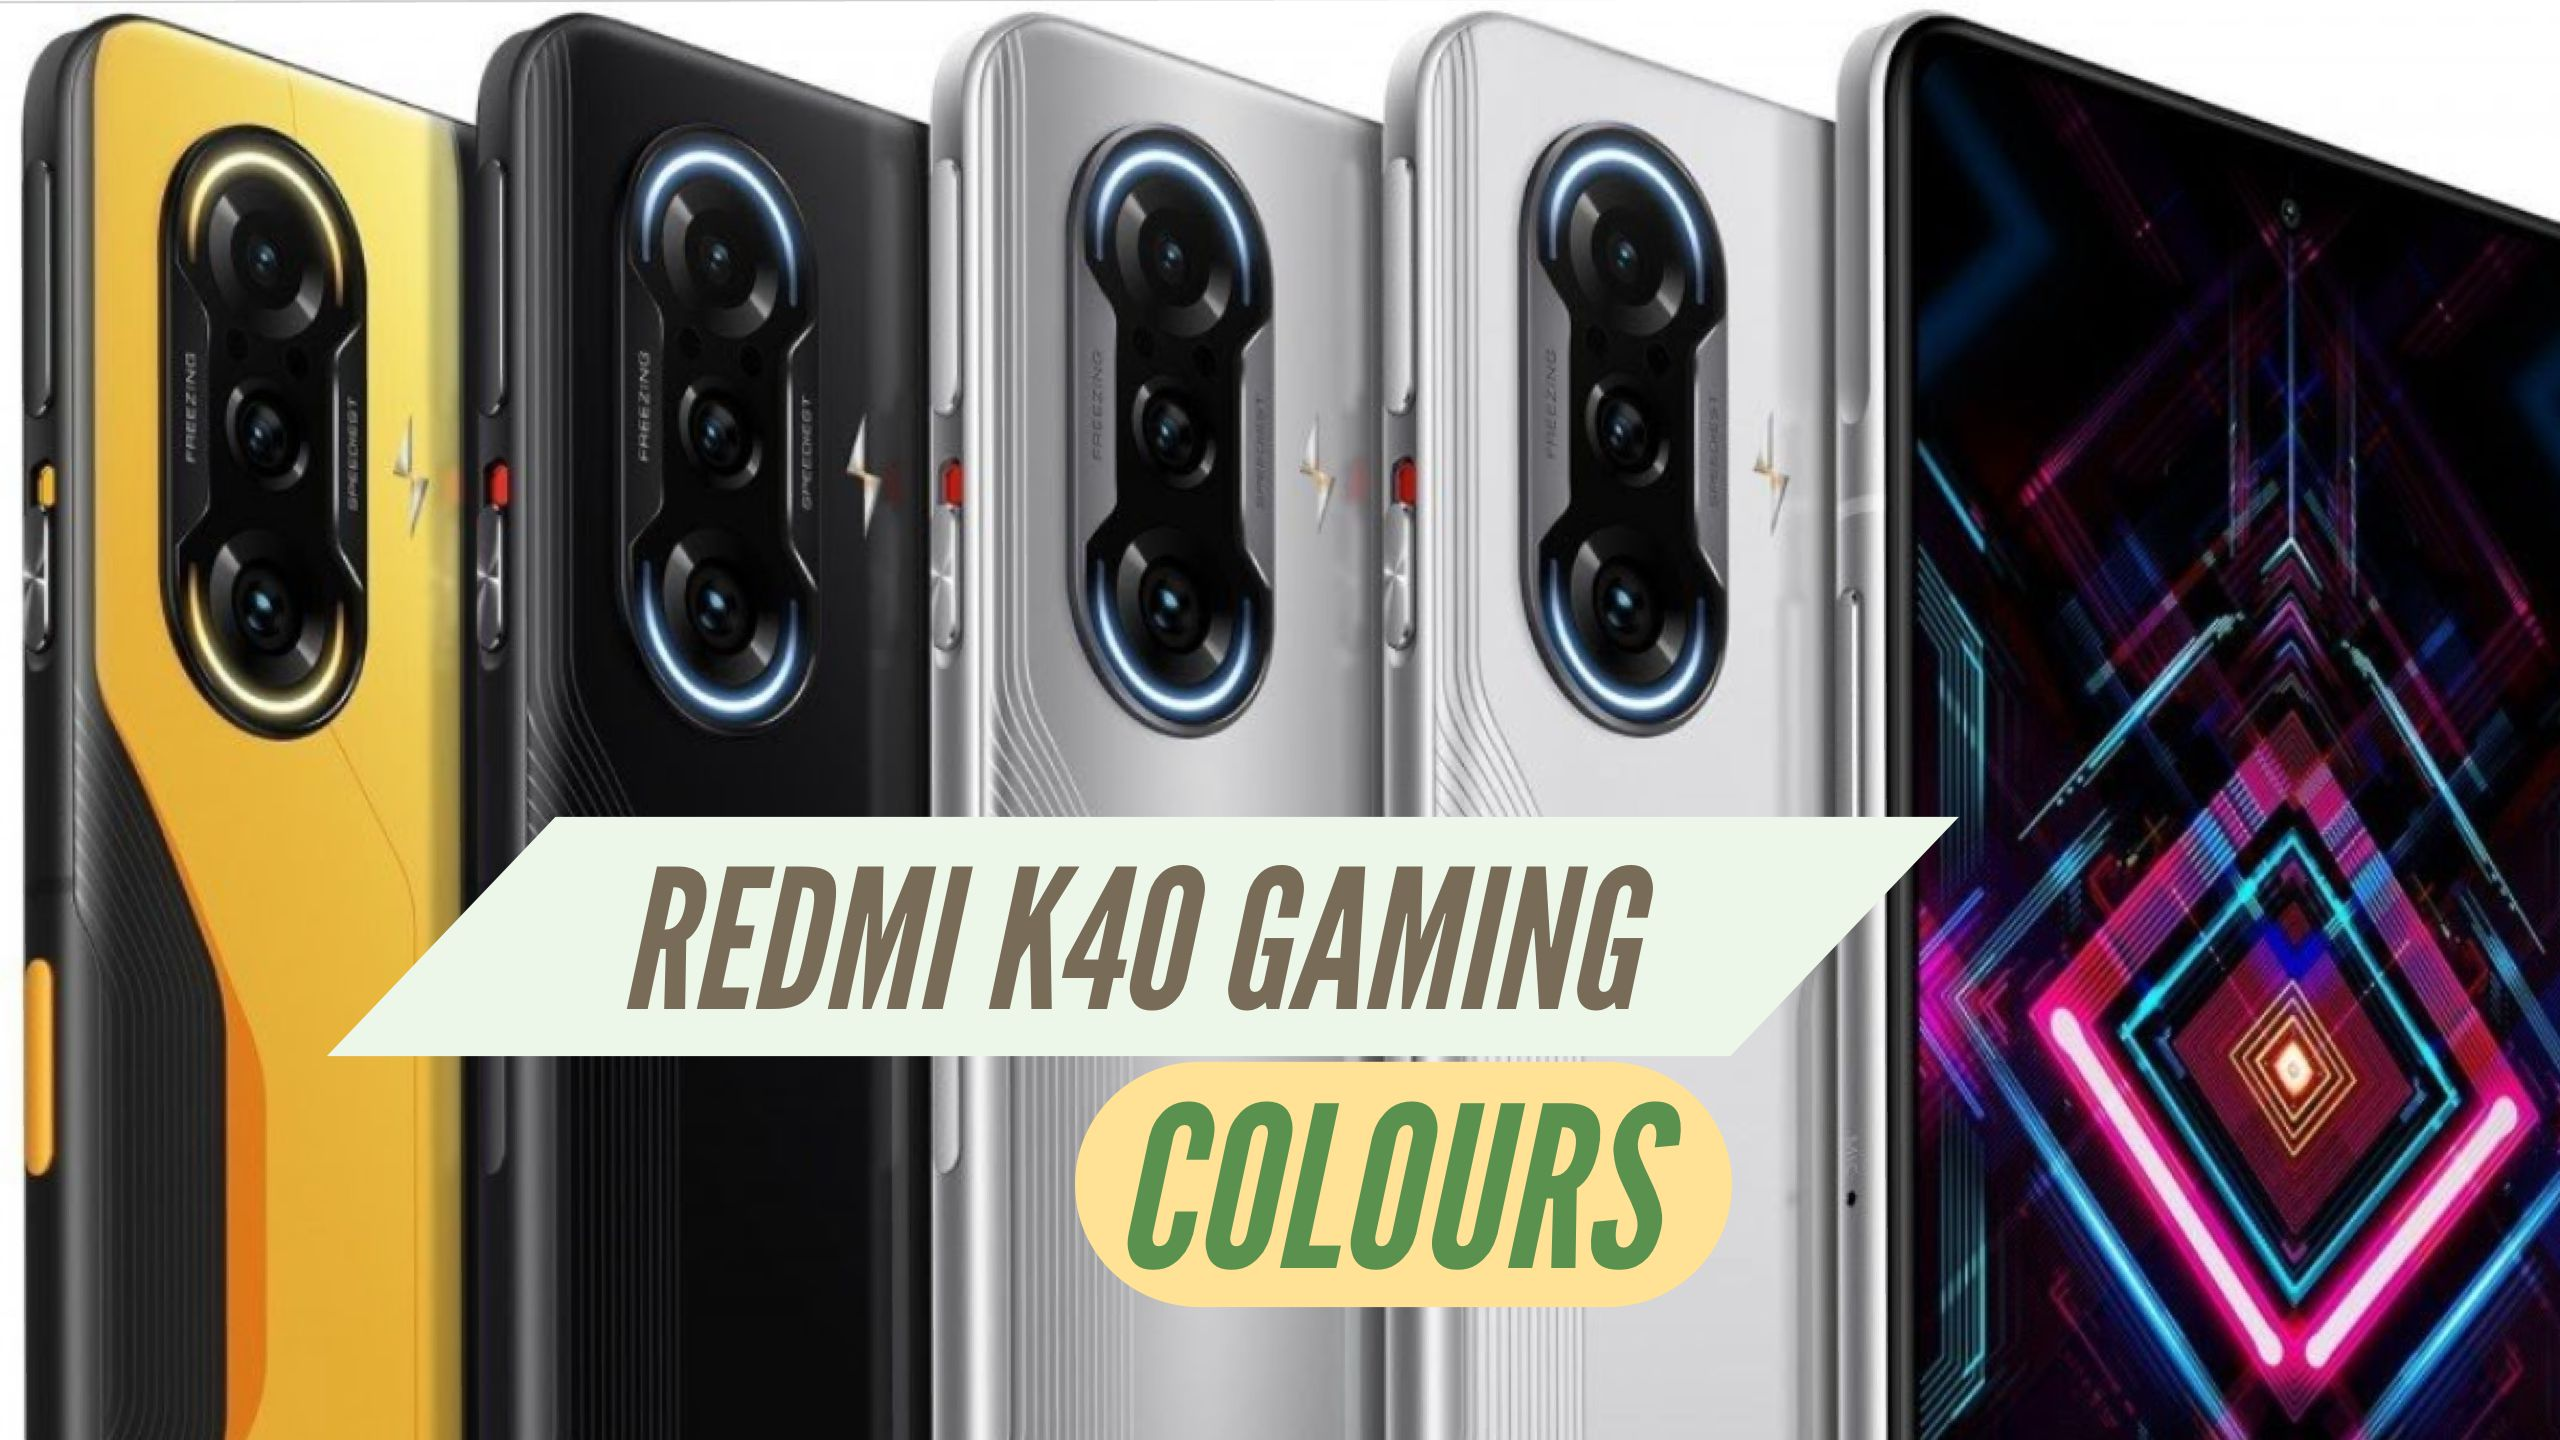 Redmi K40 Gaming Colours